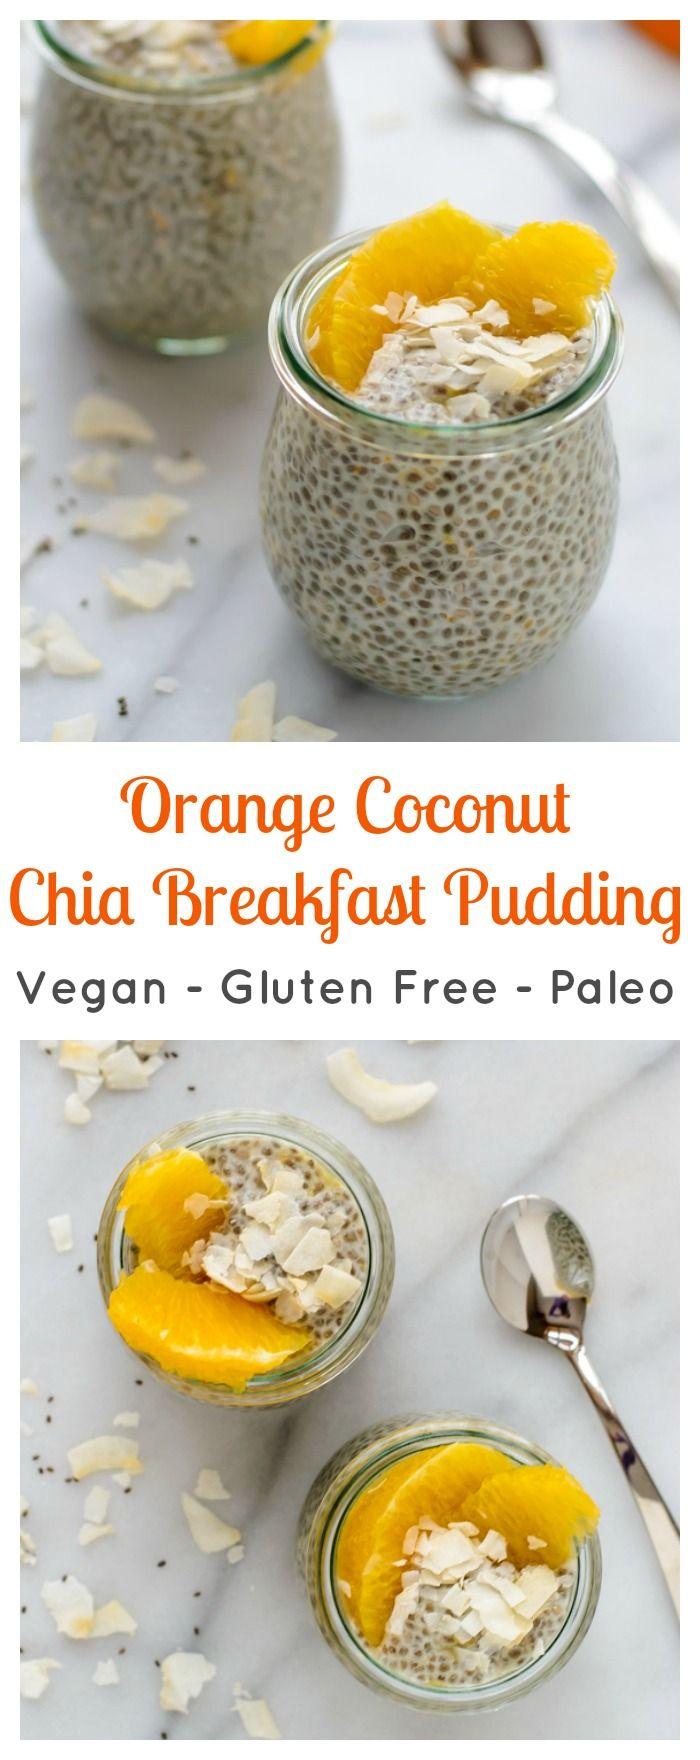 Orange Coconut Chia Breakfast Pudding. Paleo, Gluten Free and Vegan